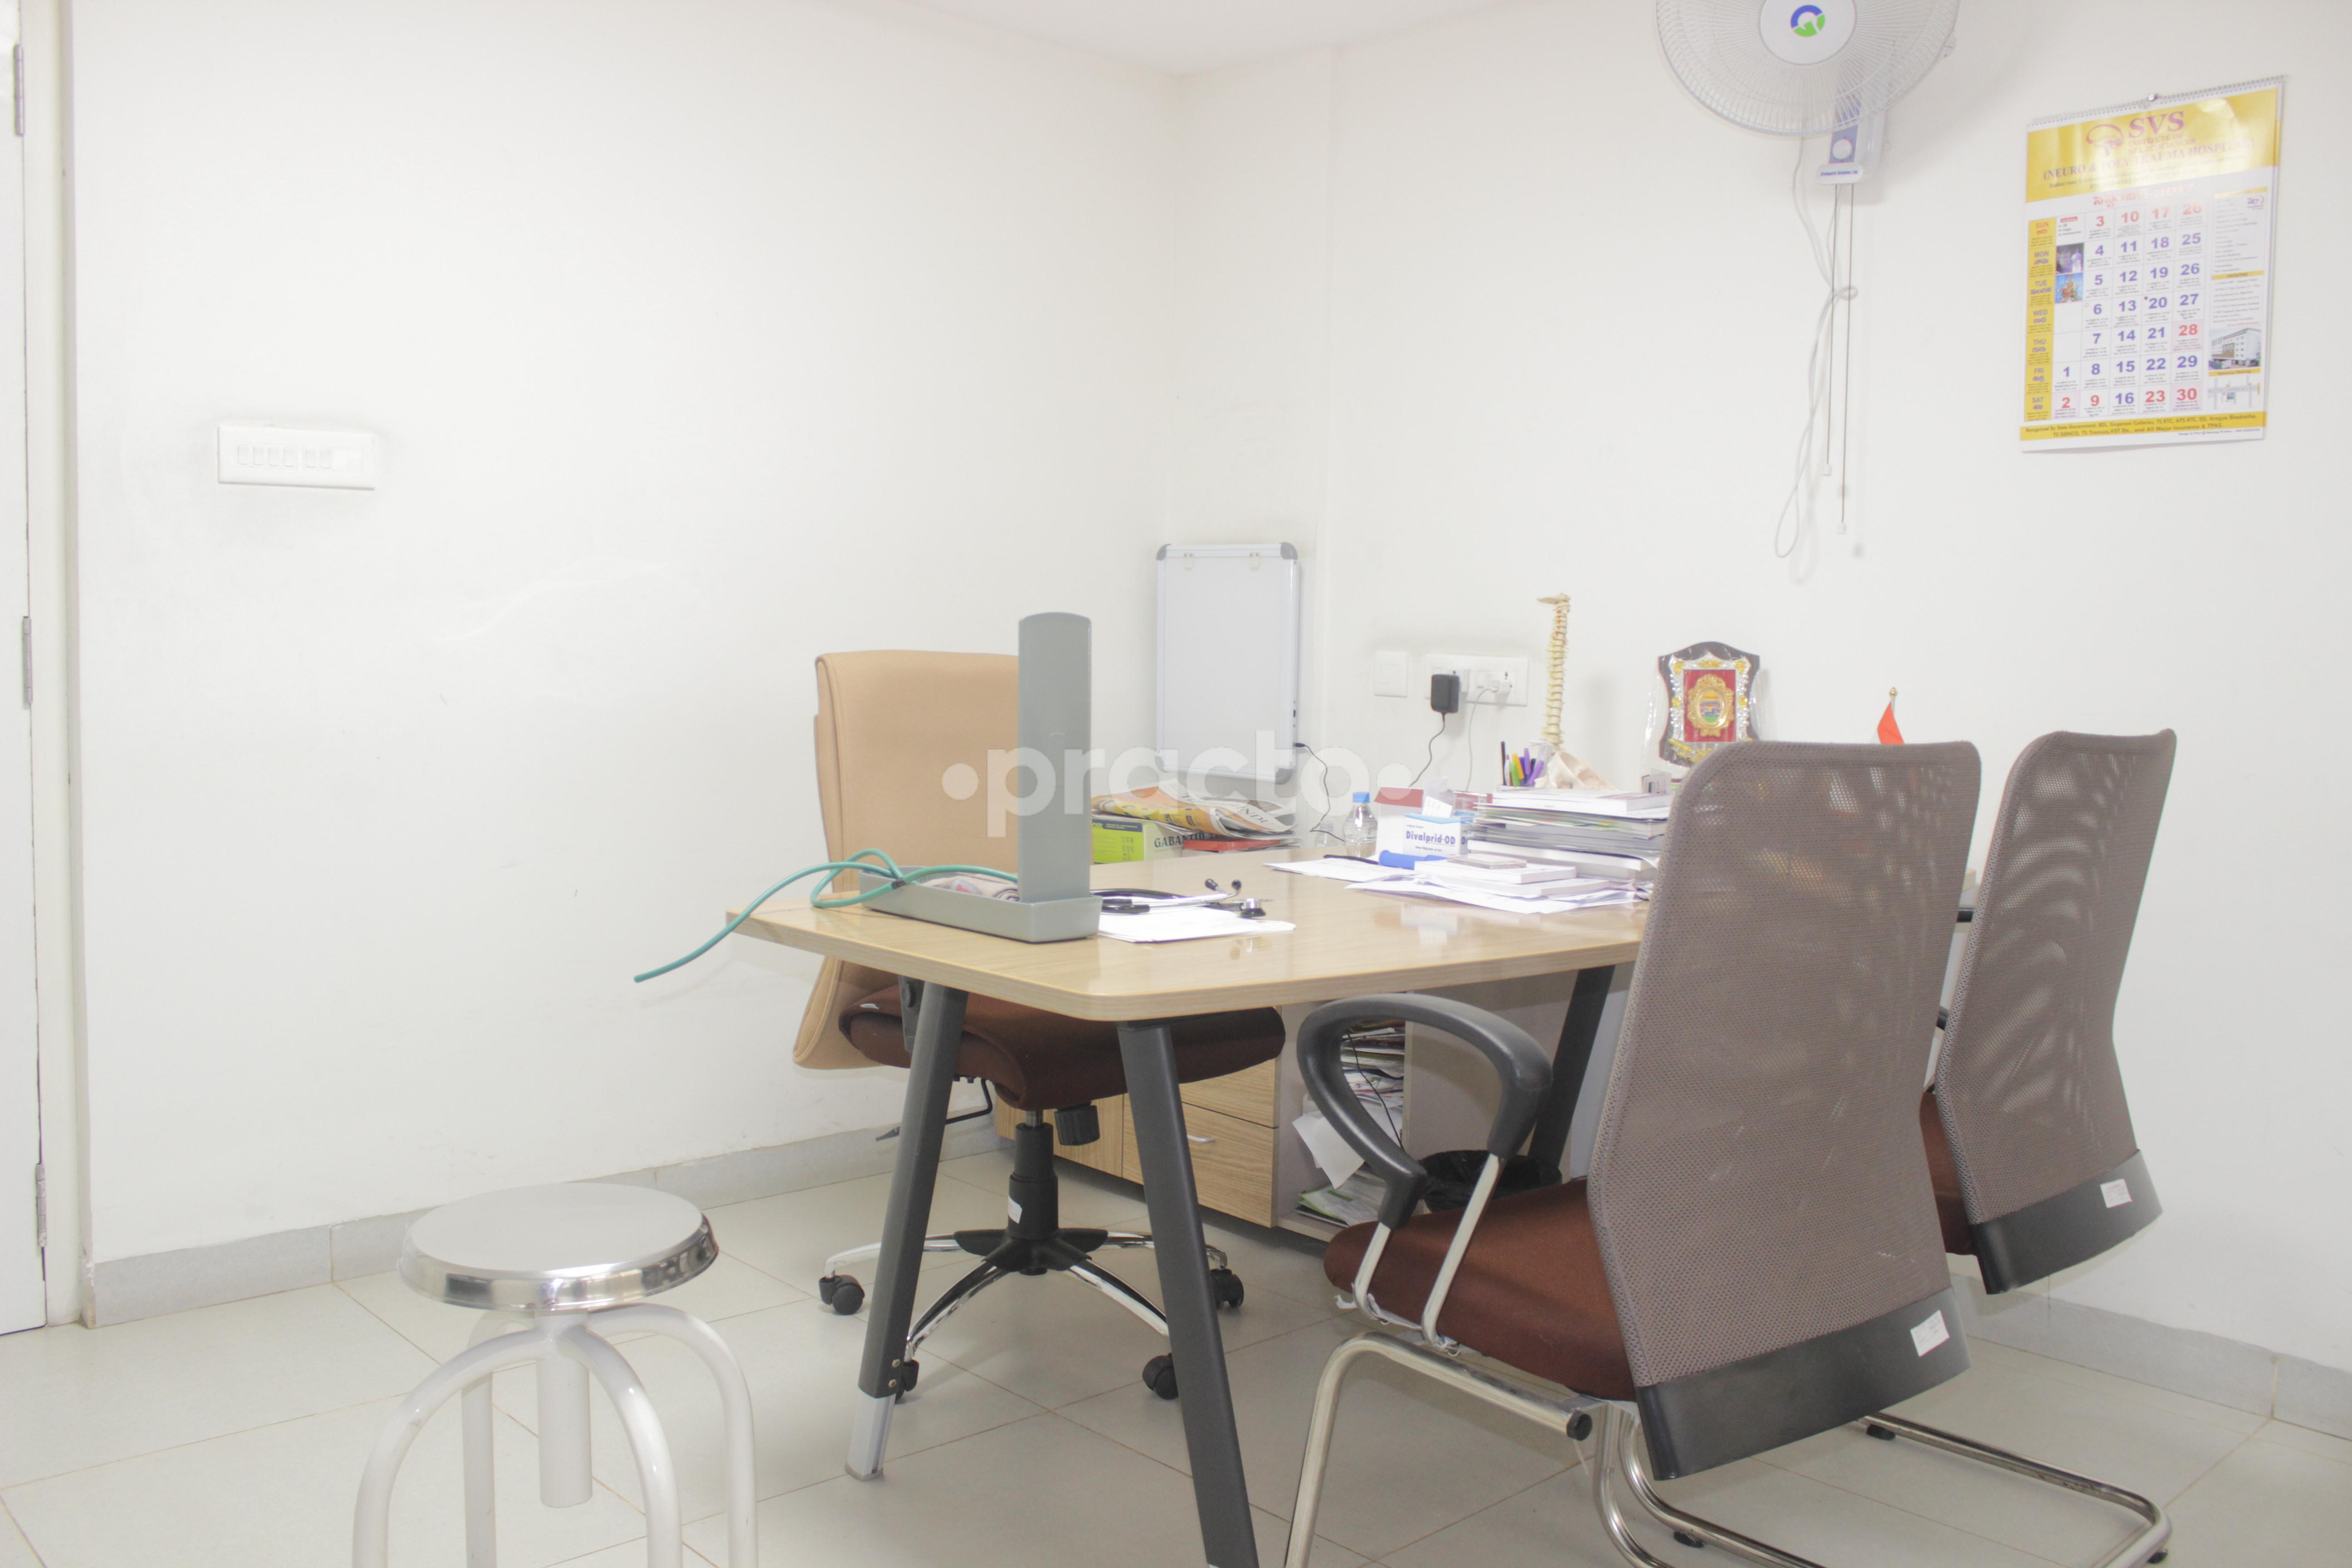 SVS Hospital Multi Speciality Hospital in Kachiguda Hyderabad